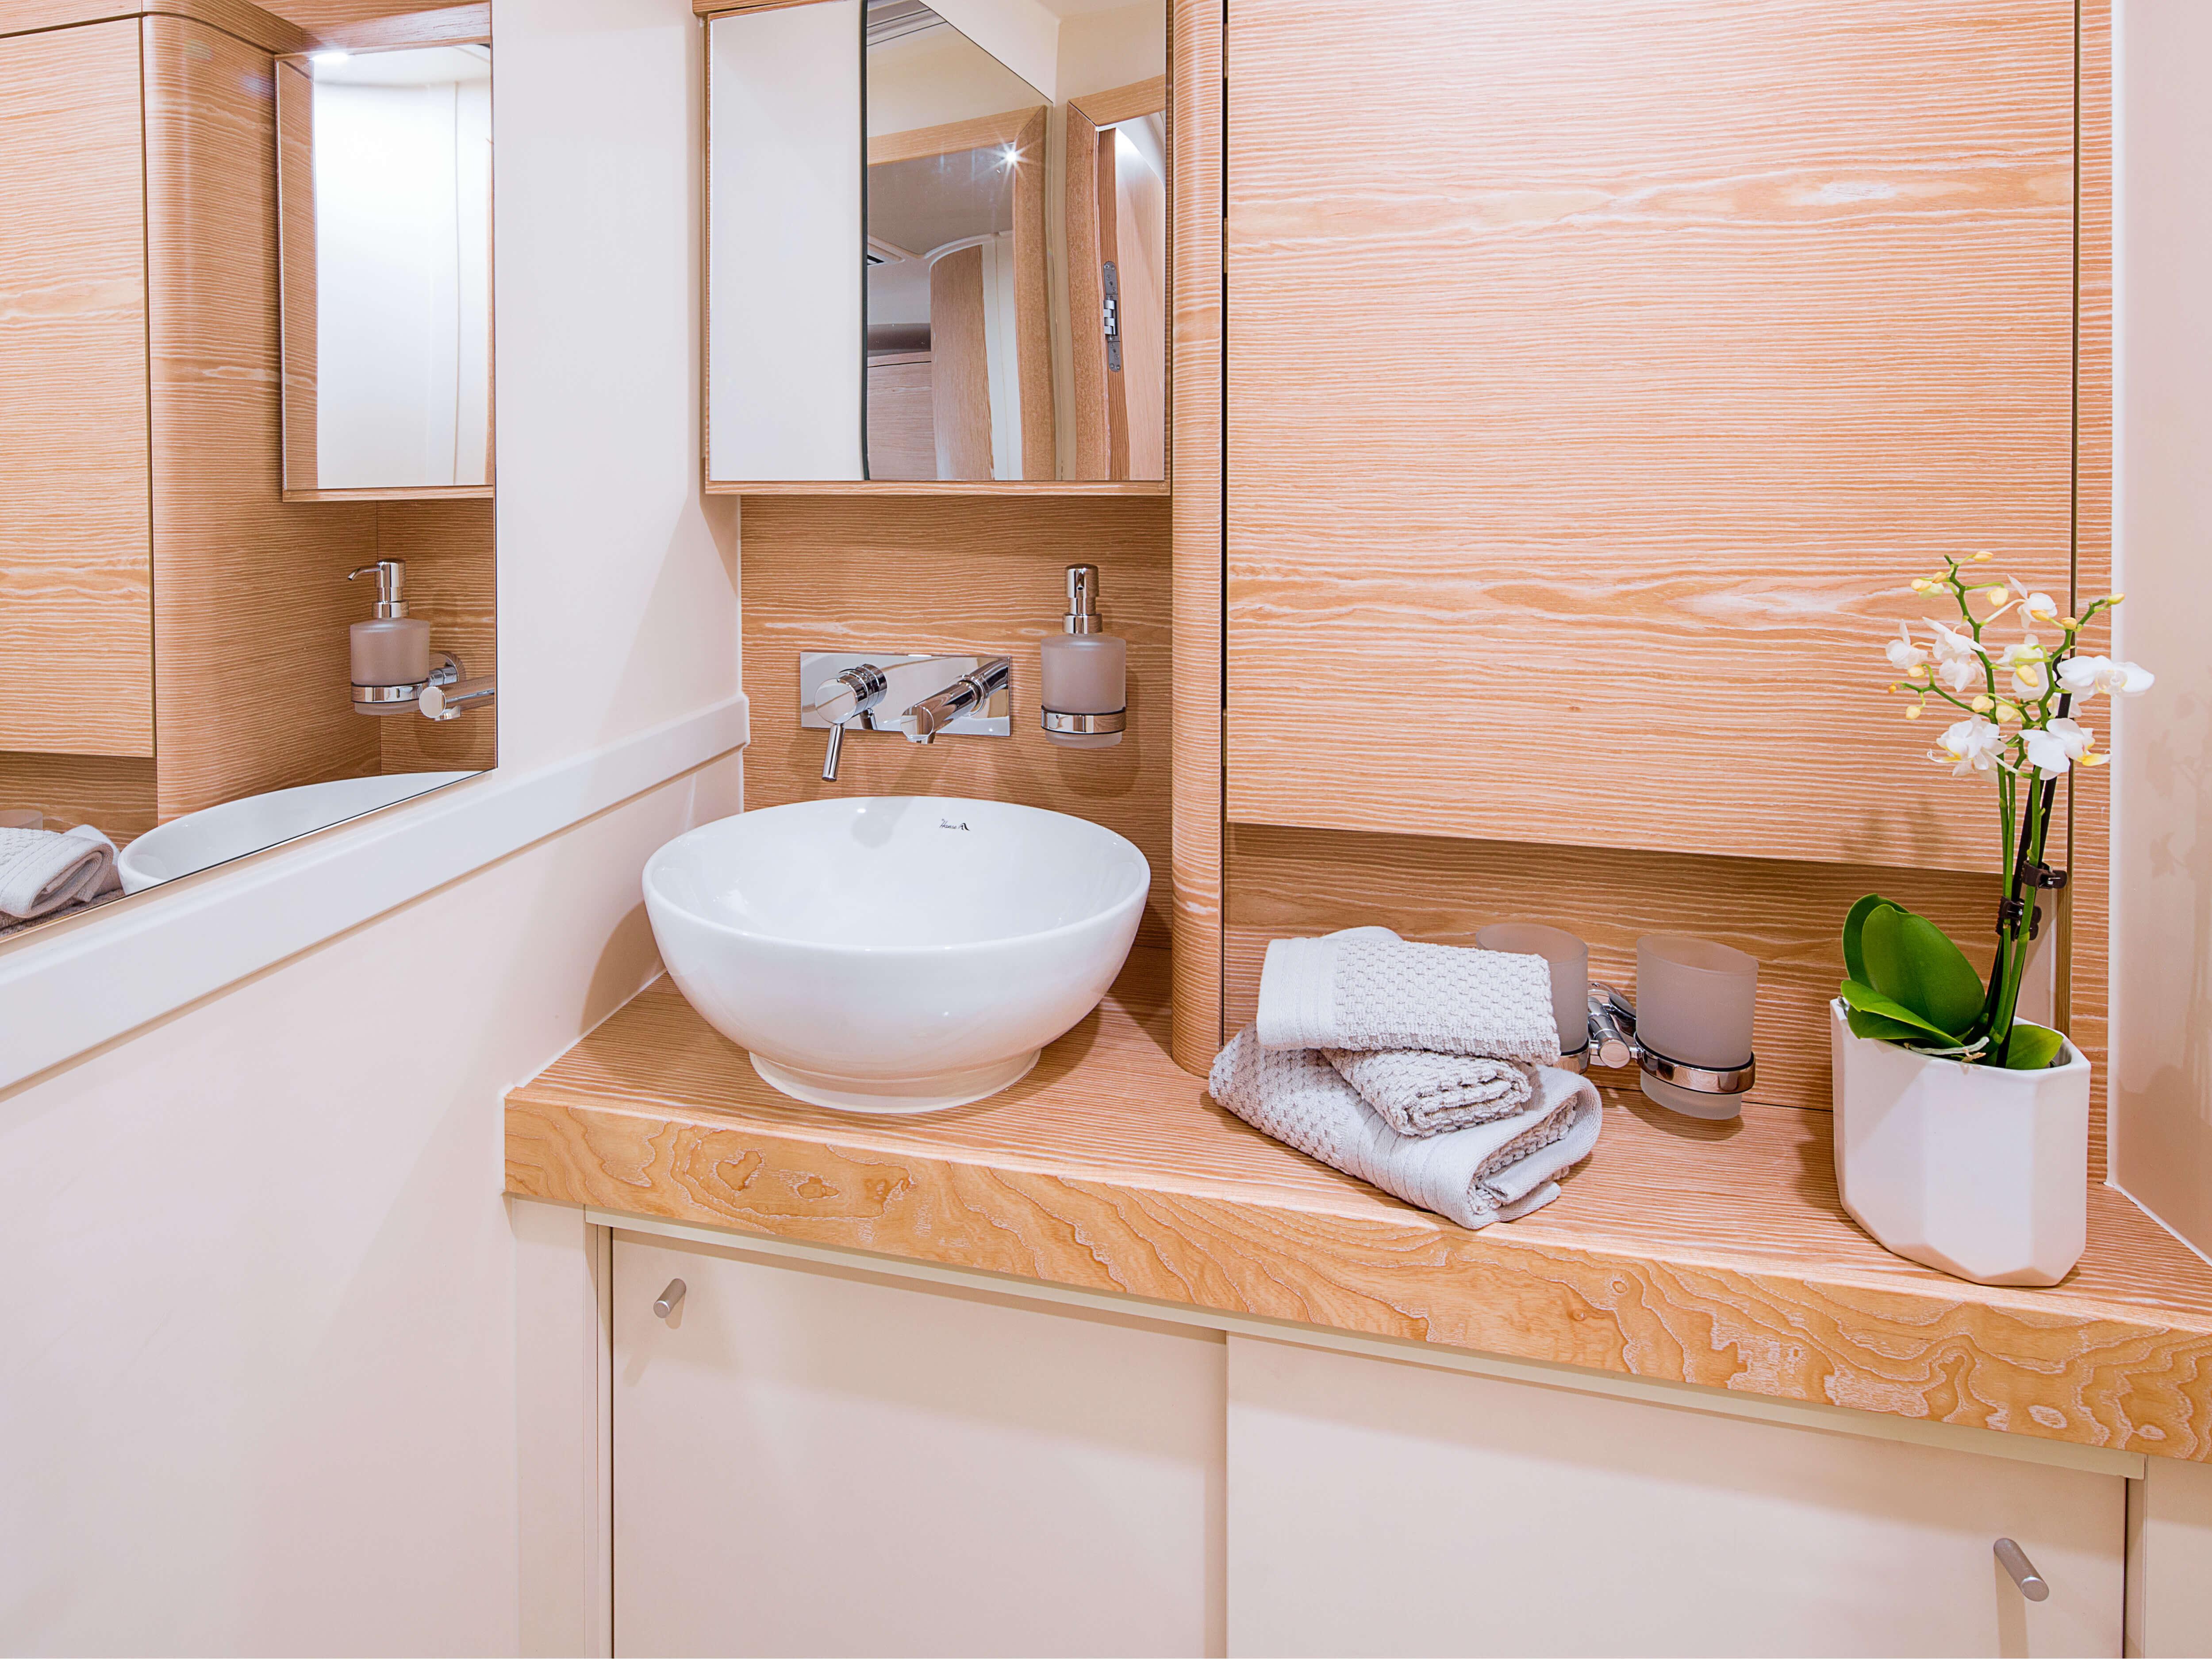 Hanse 588 | sink, mirror | Hanse